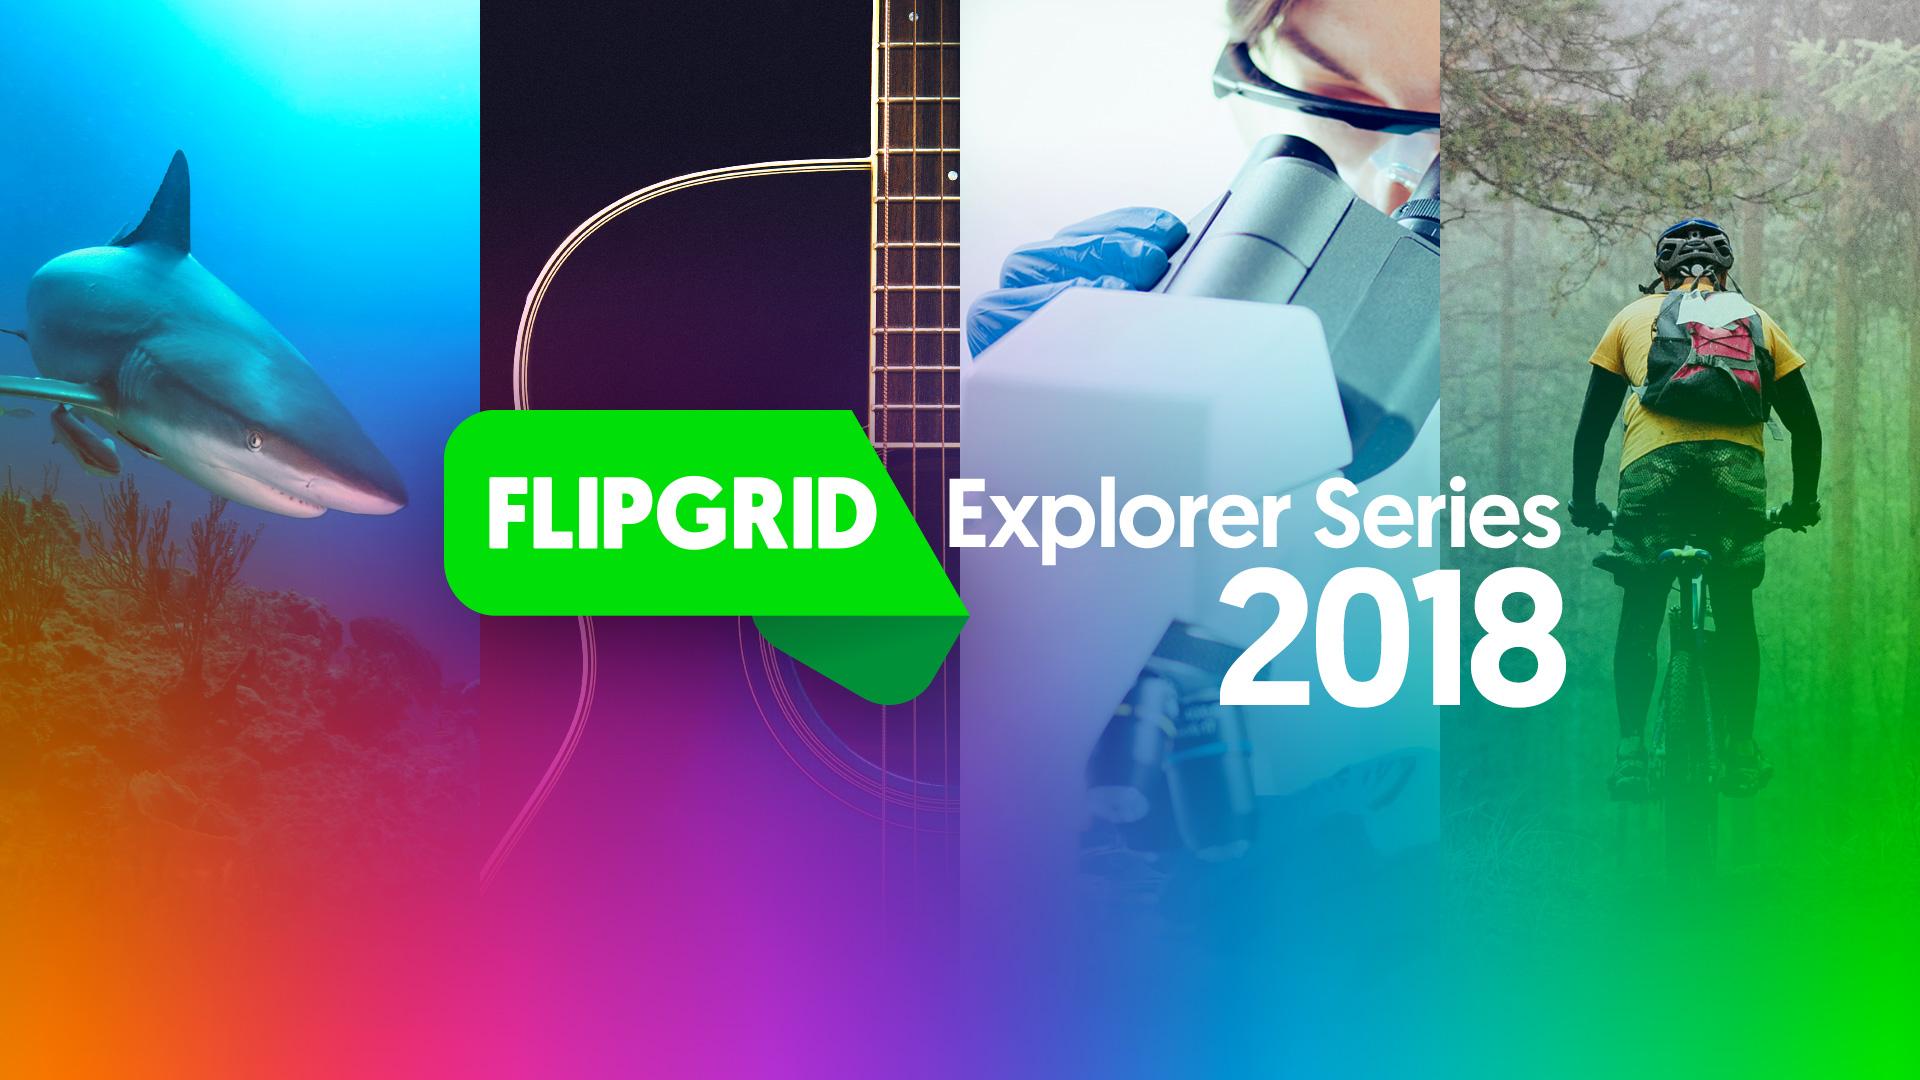 flipgridExlporerSeries2018.jpg